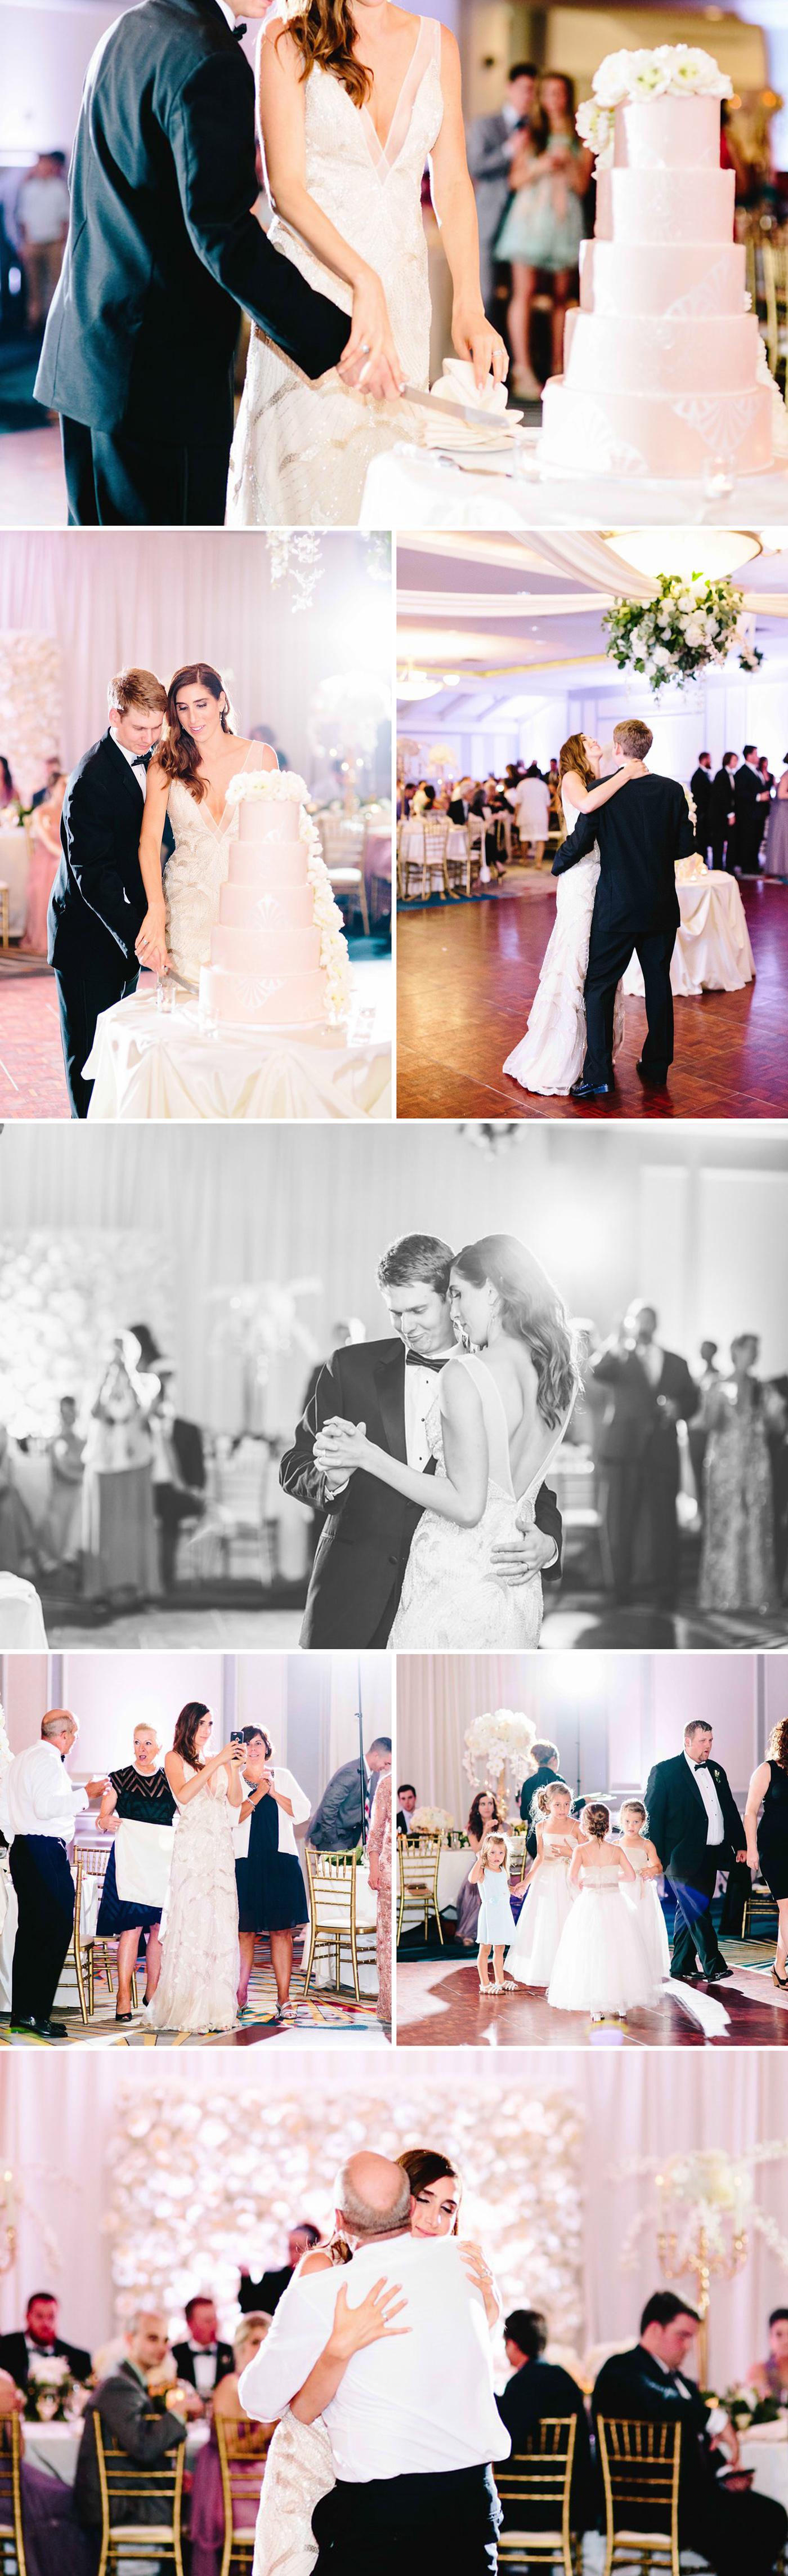 chicago-fine-art-wedding-photography-owens6